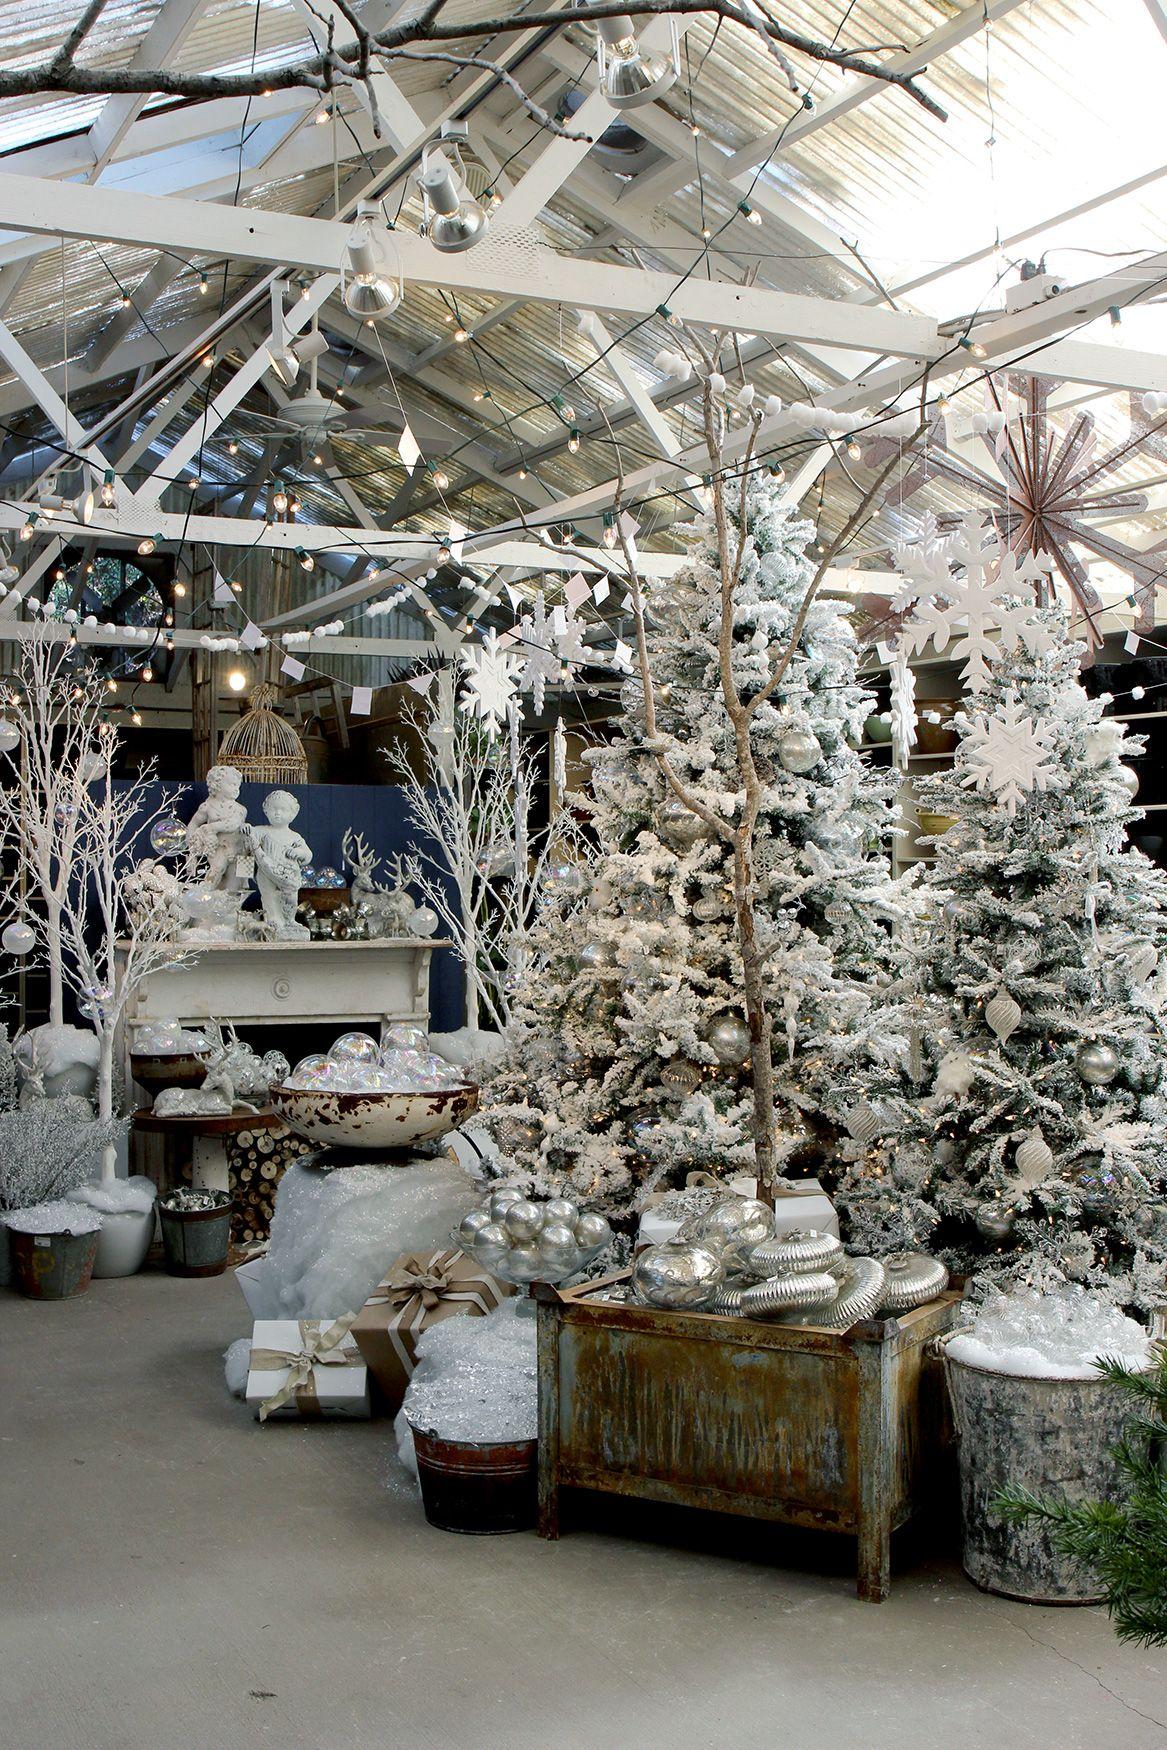 winter wonderland holiday decorating christmas shop displays christmas store woodland. Black Bedroom Furniture Sets. Home Design Ideas